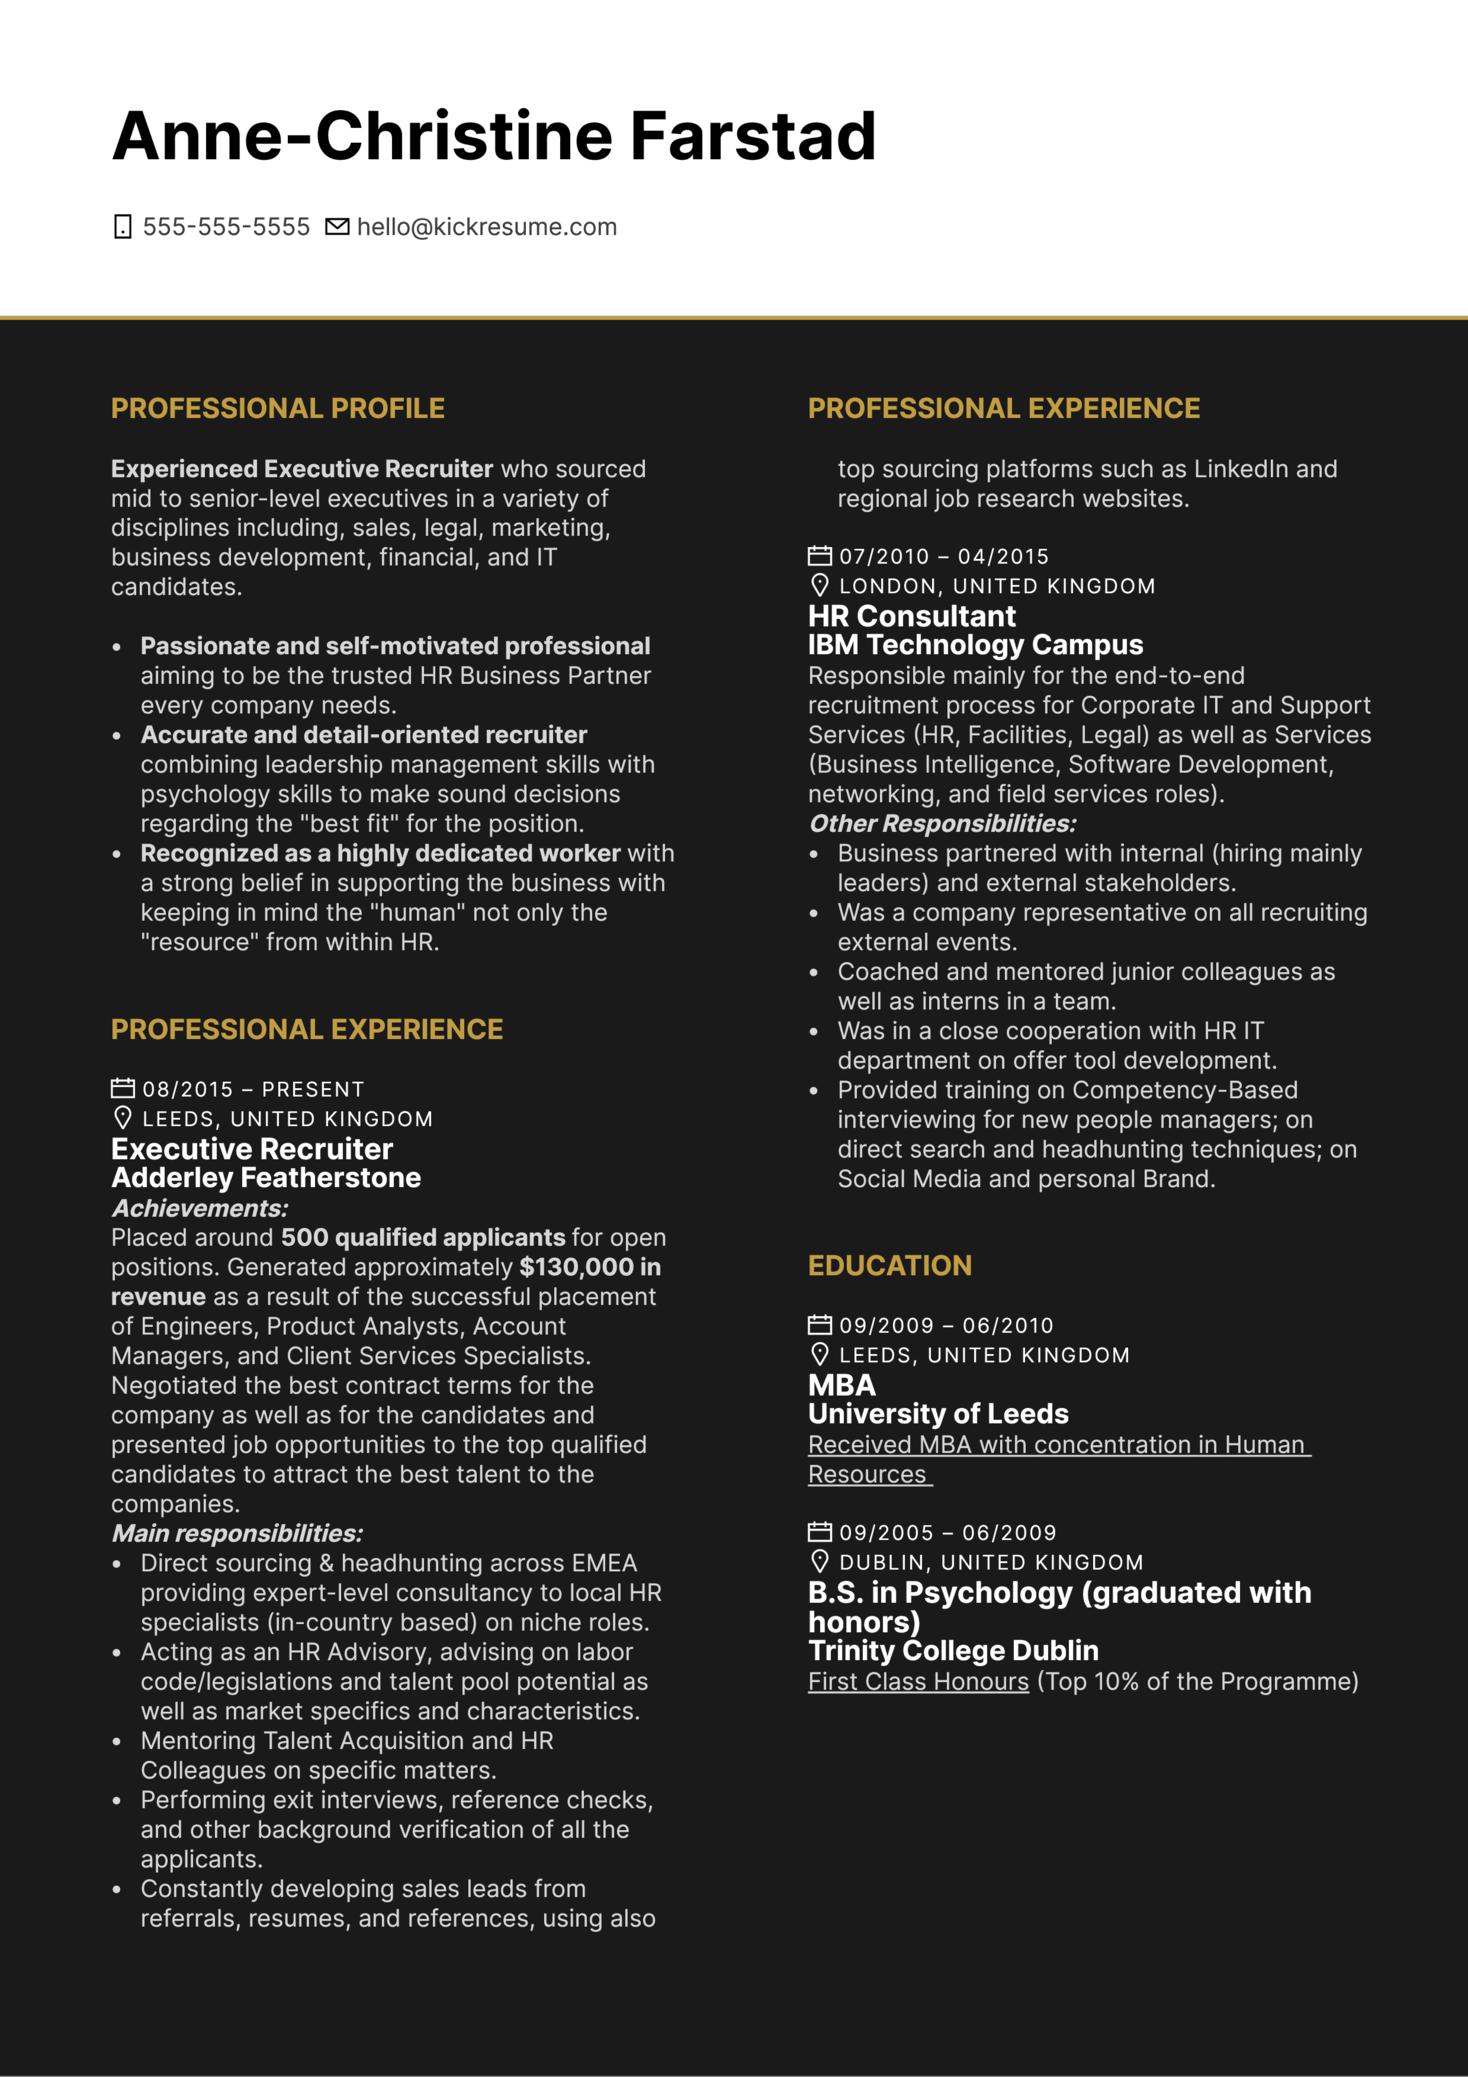 Executive Recruiter Resume Example (Parte 1)